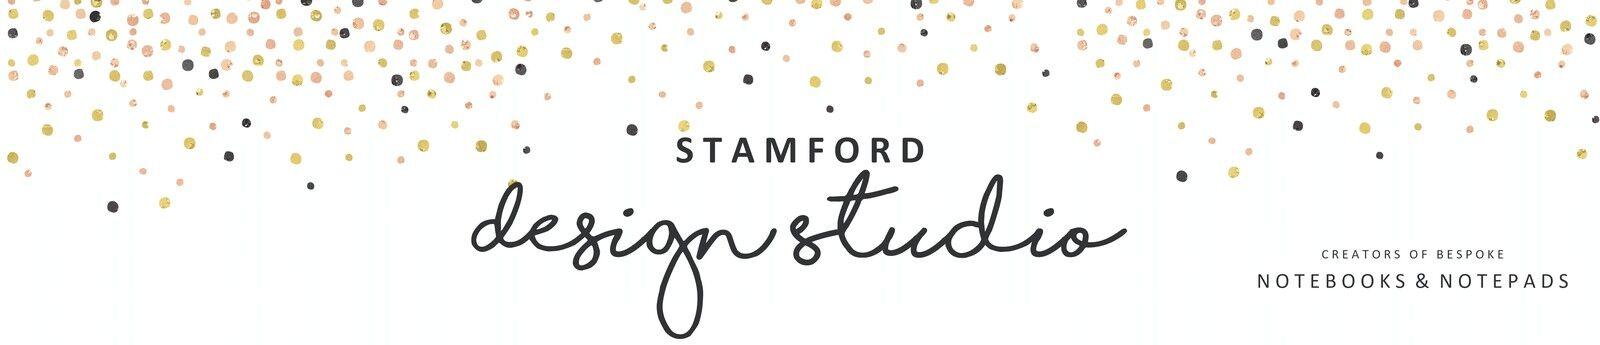 Stamford Design Studio